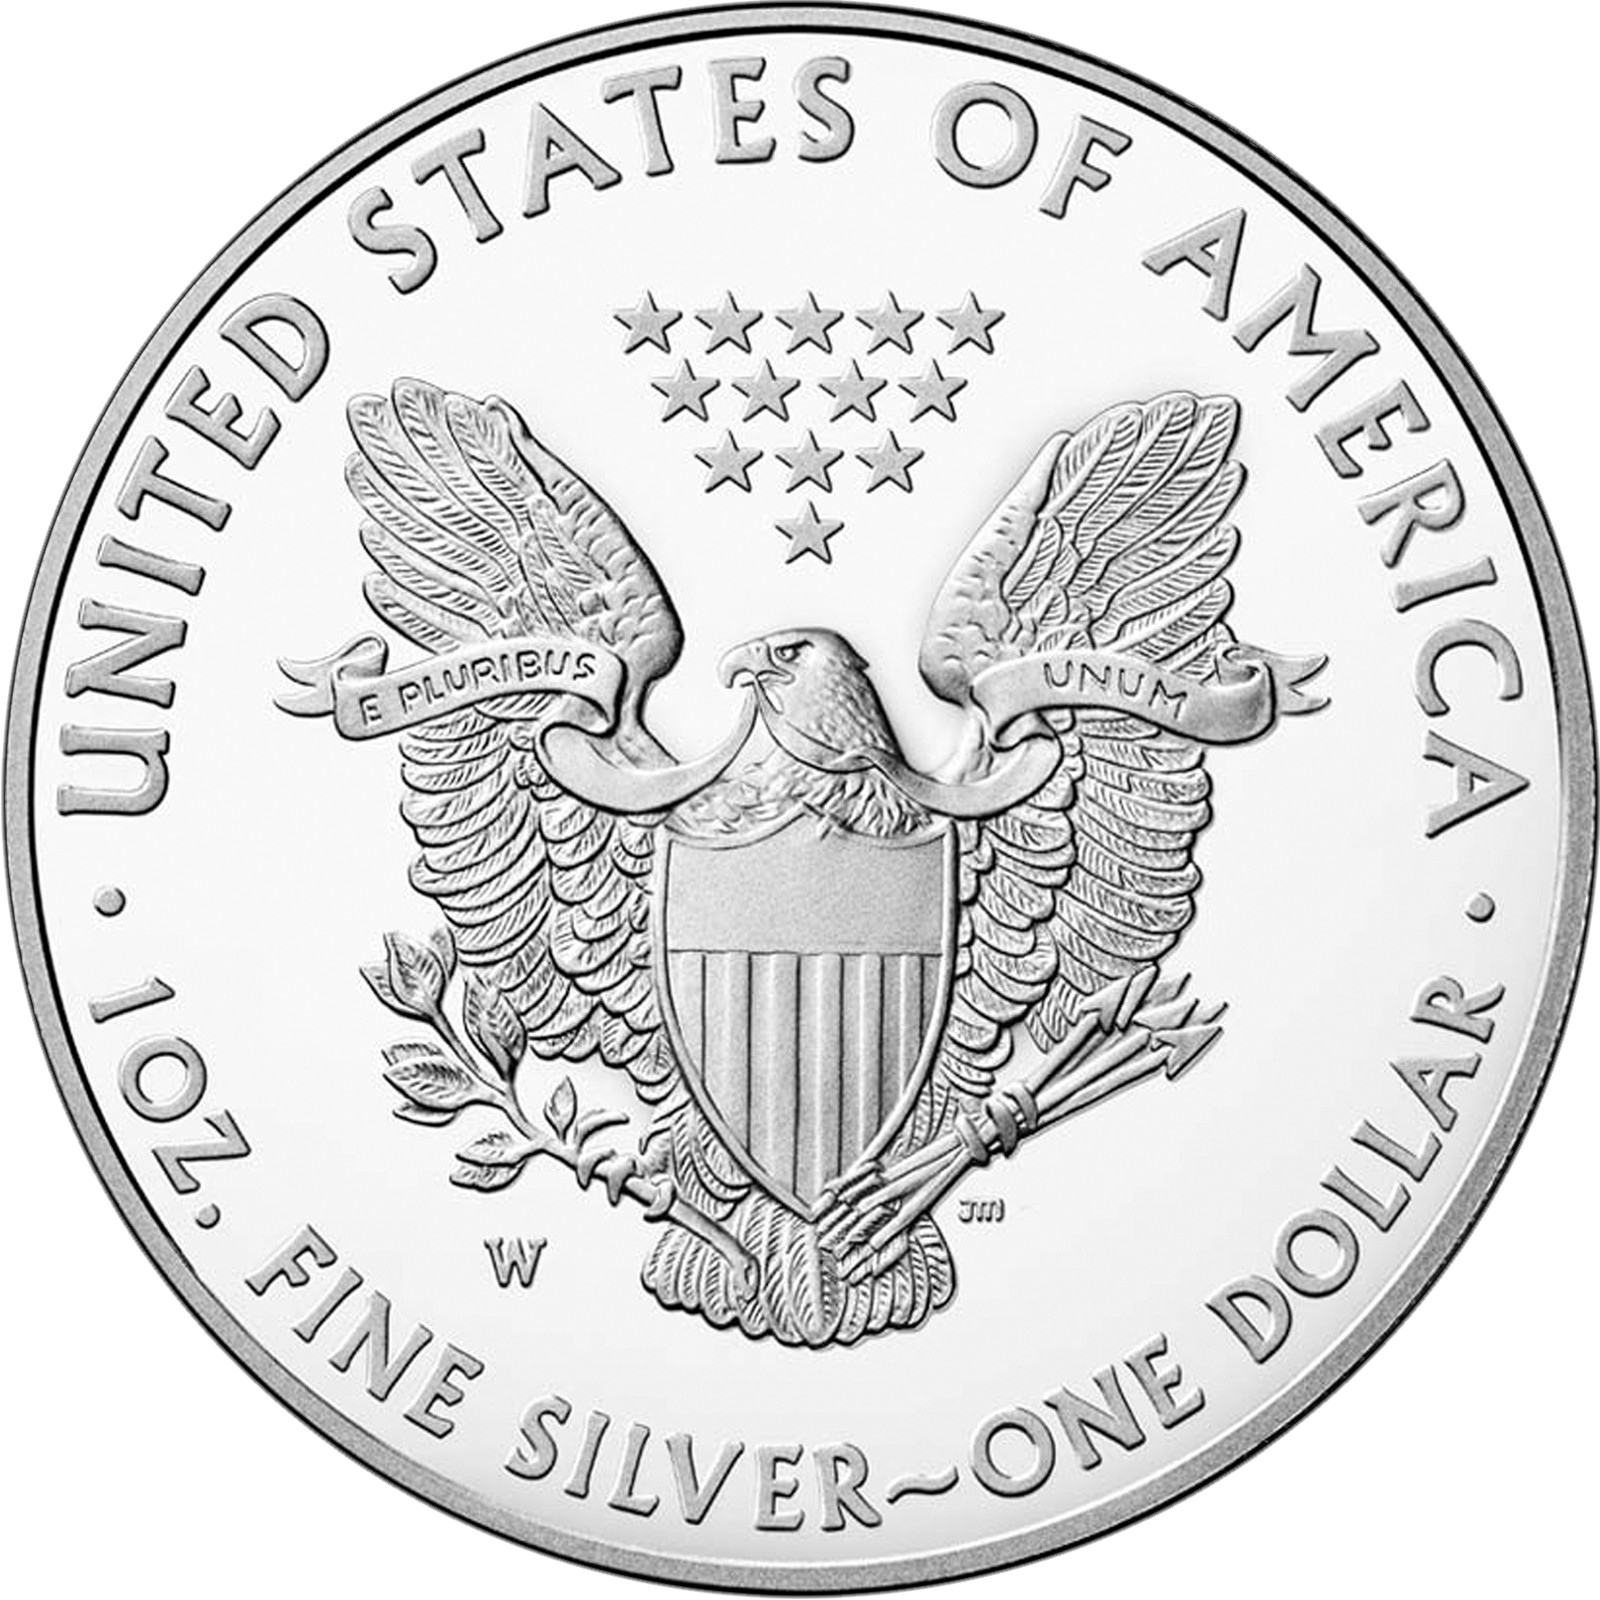 W Silver American Eagle Coin Pf In Ogp